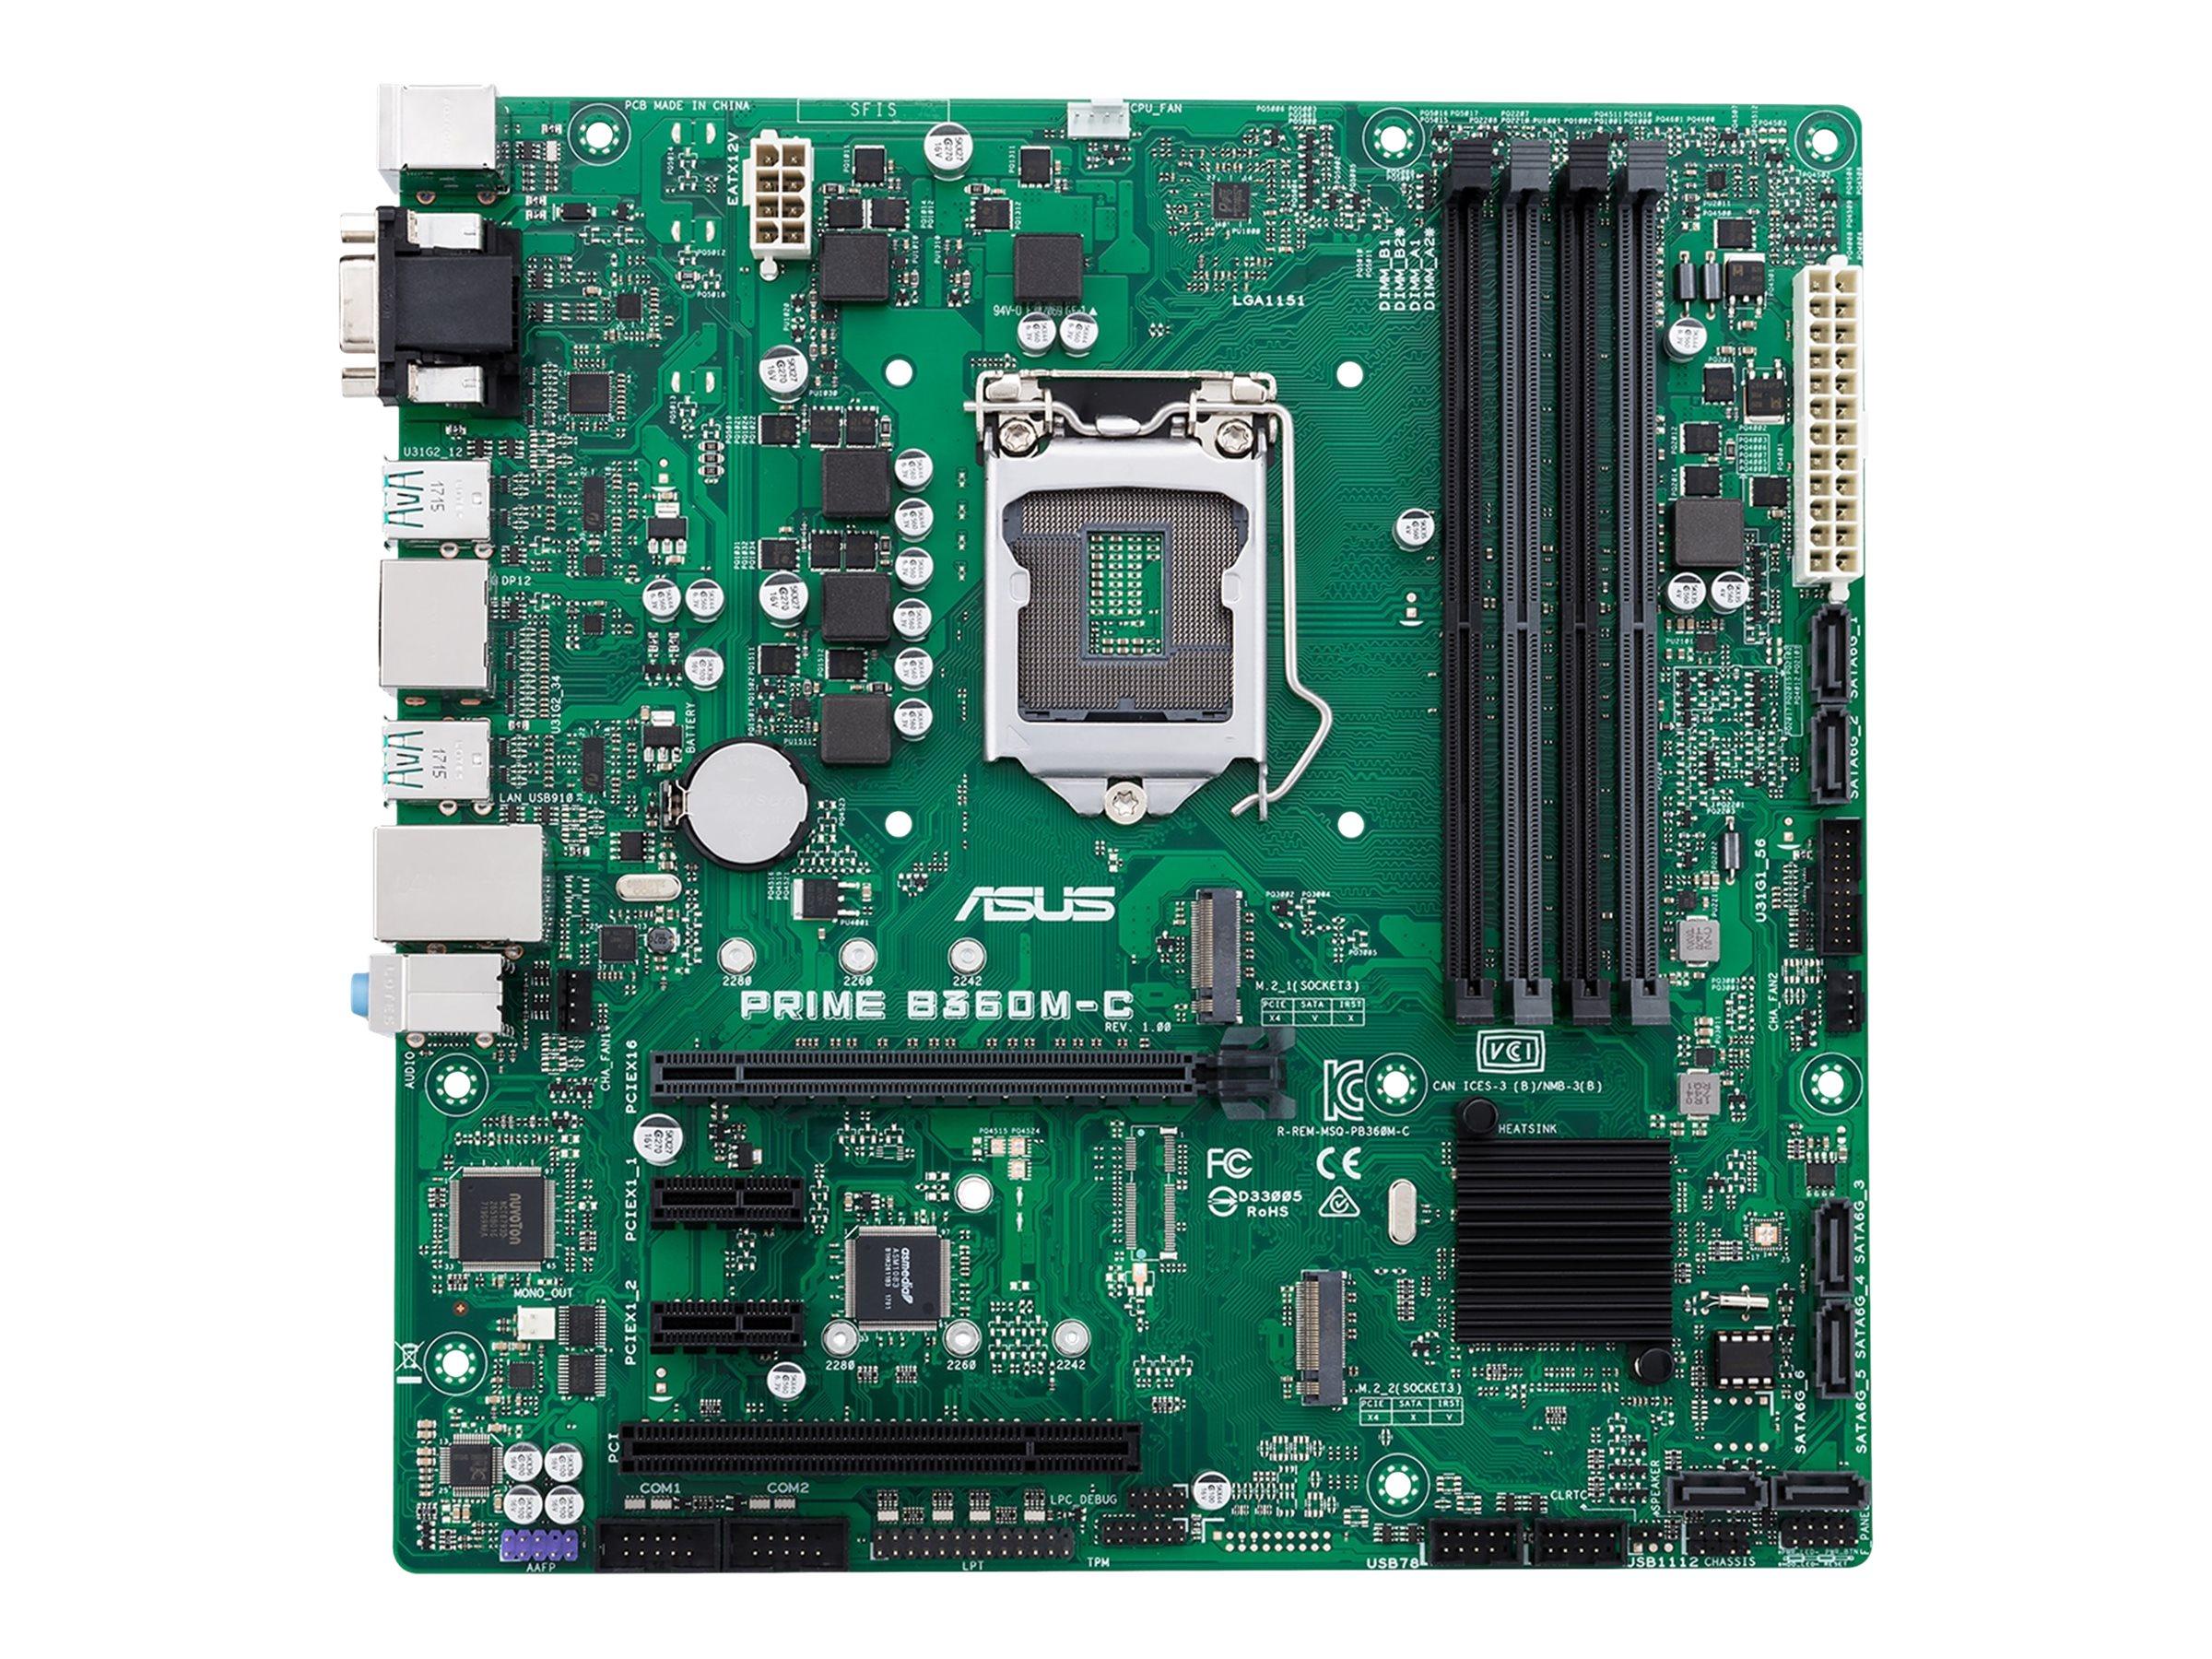 ASUS PRIME B360M-C - Motherboard - micro ATX - LGA1151 Socket - B360 - USB 3.1 Gen 1, USB 3.1 Gen 2 - Gigabit LAN - Onboard-Grafik (CPU erforderlich)